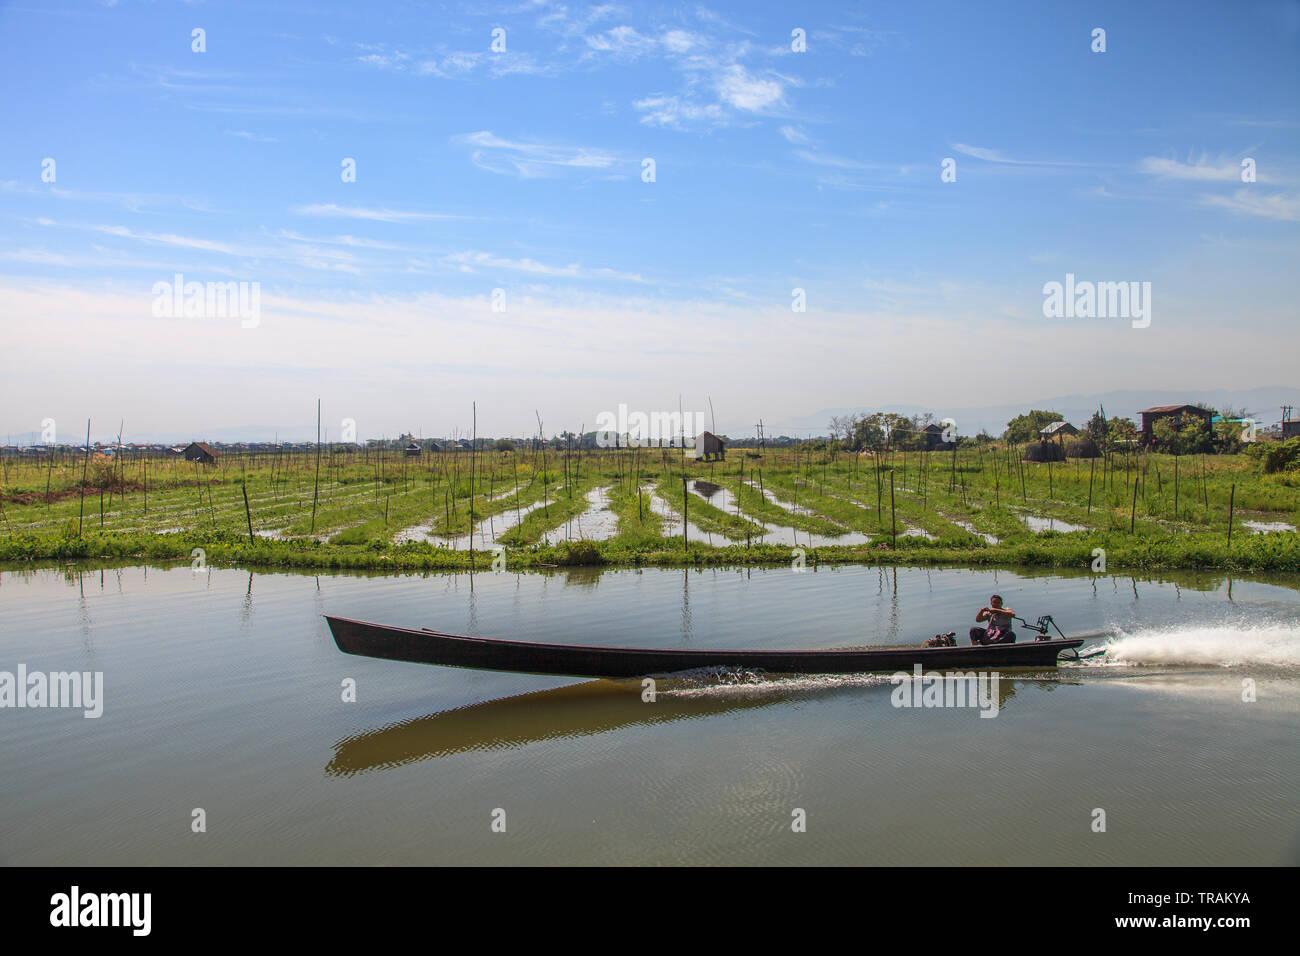 Floating vegetable gardens at Inle Lake, Myanmar - Stock Image